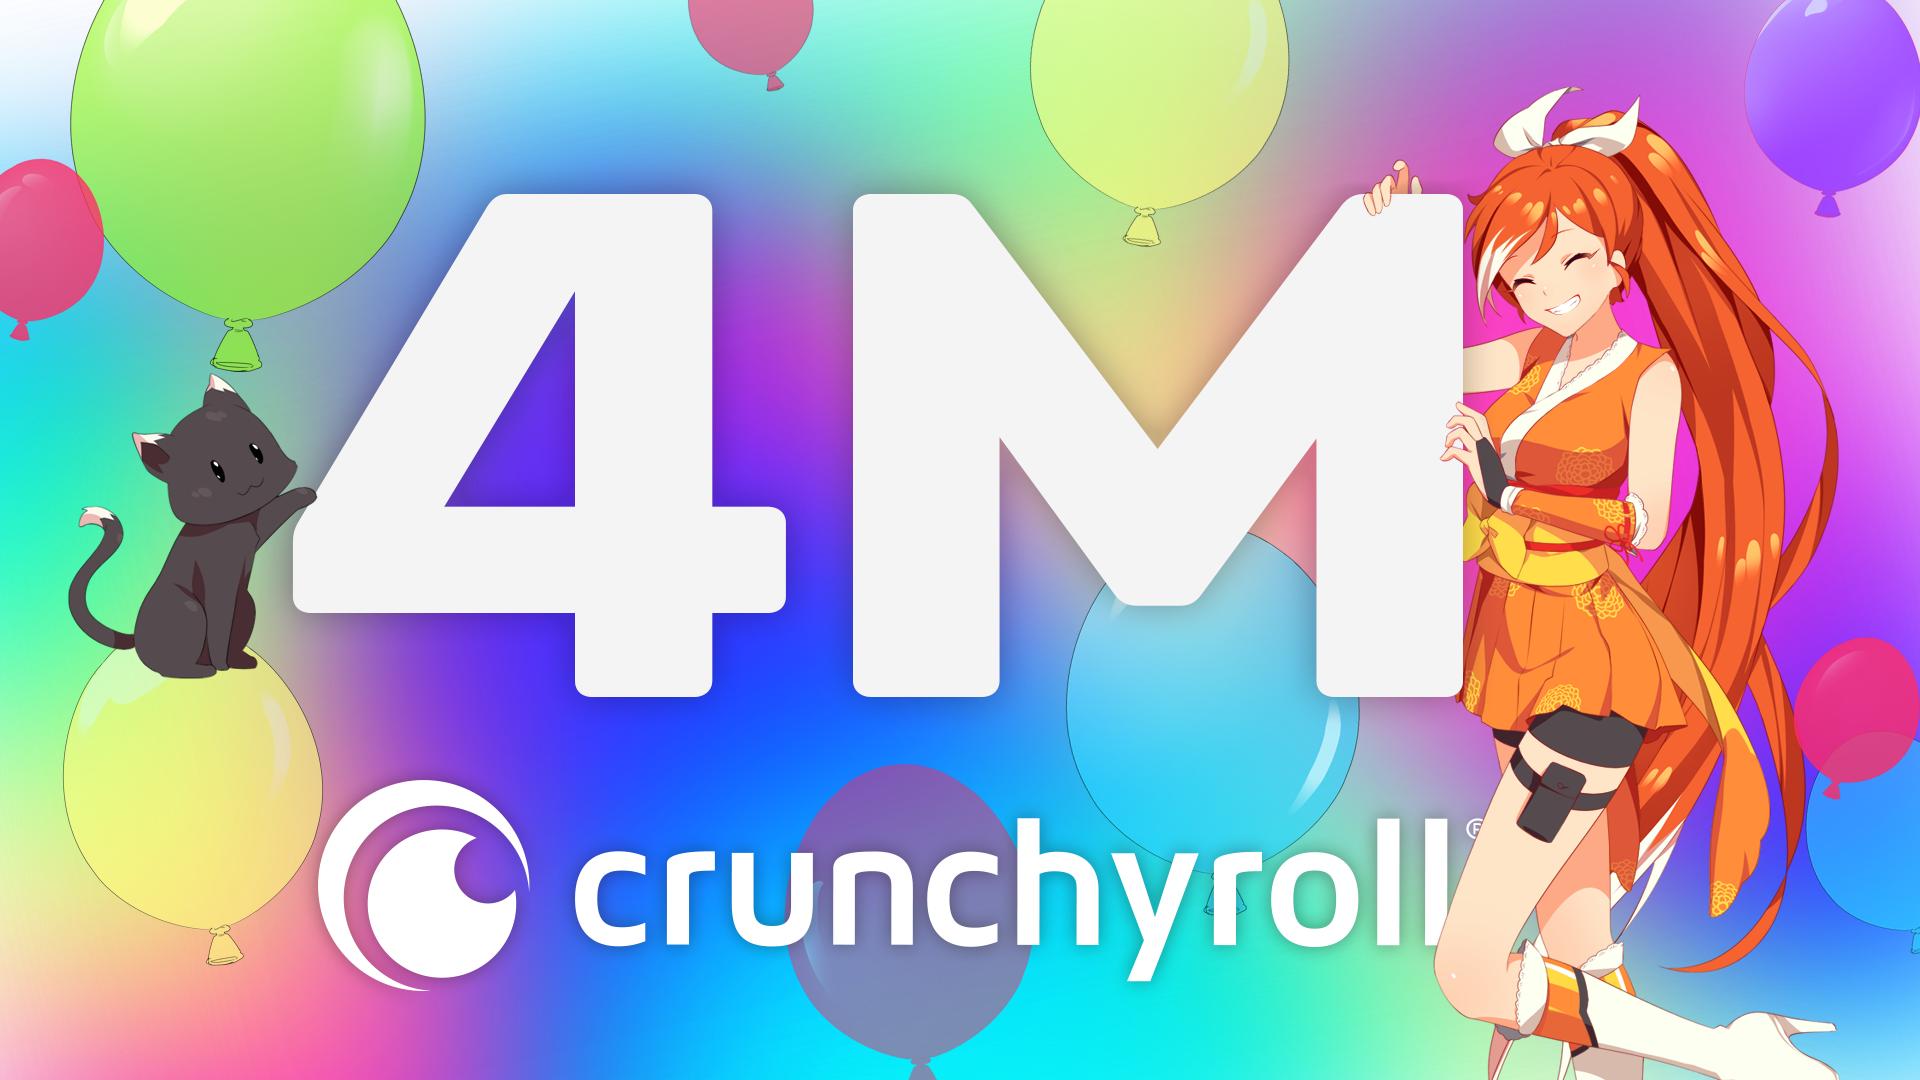 Crunchyroll Reaches Four Million Subscribers